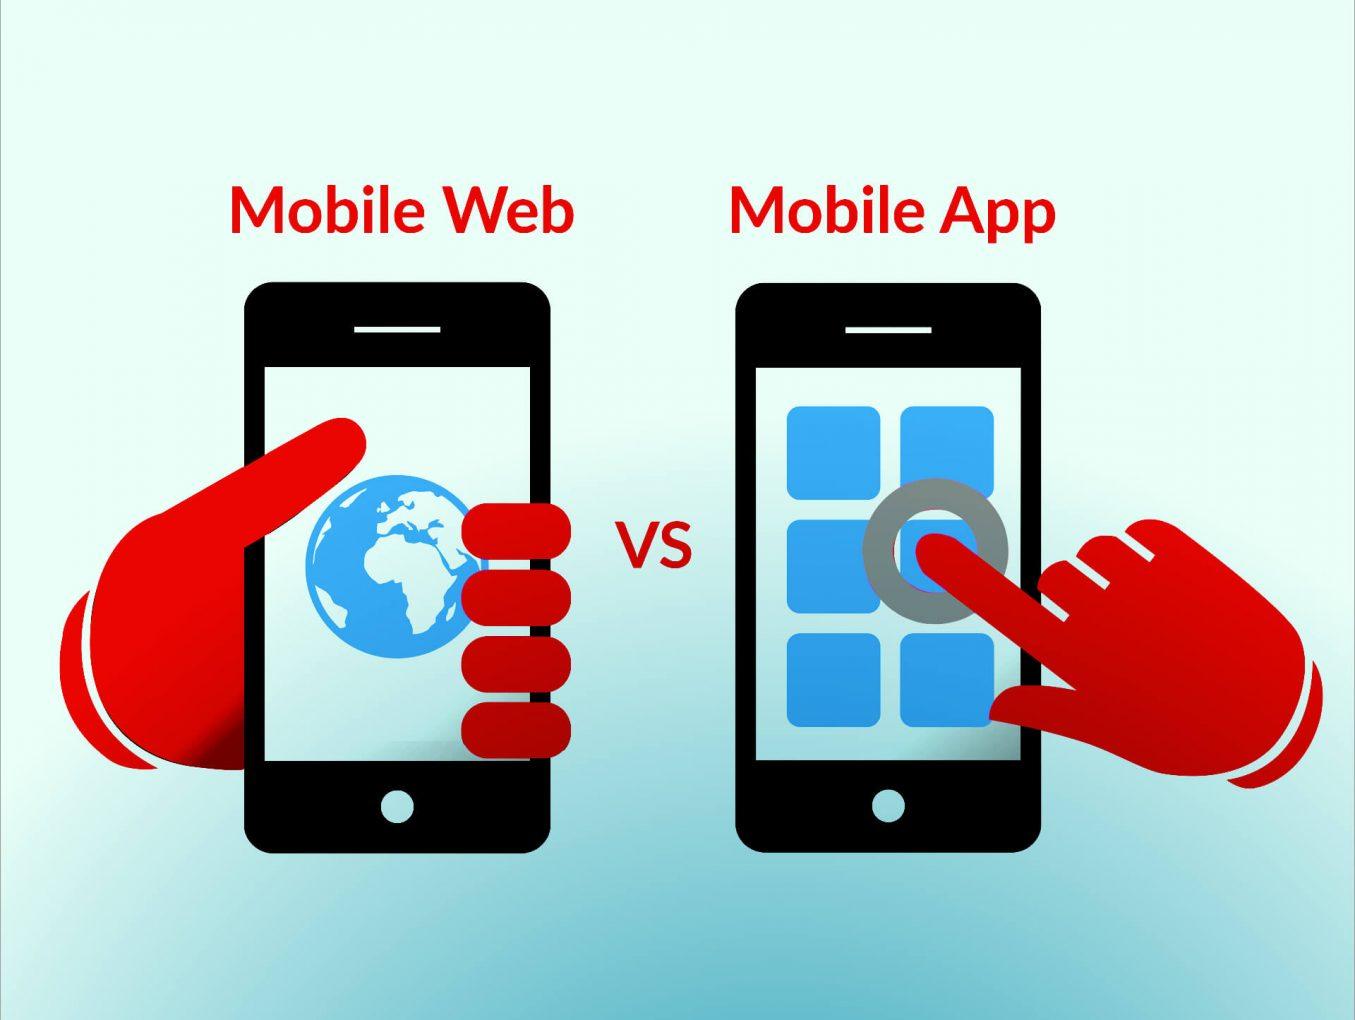 mobilewebvsmobileapp-2-1355x1020